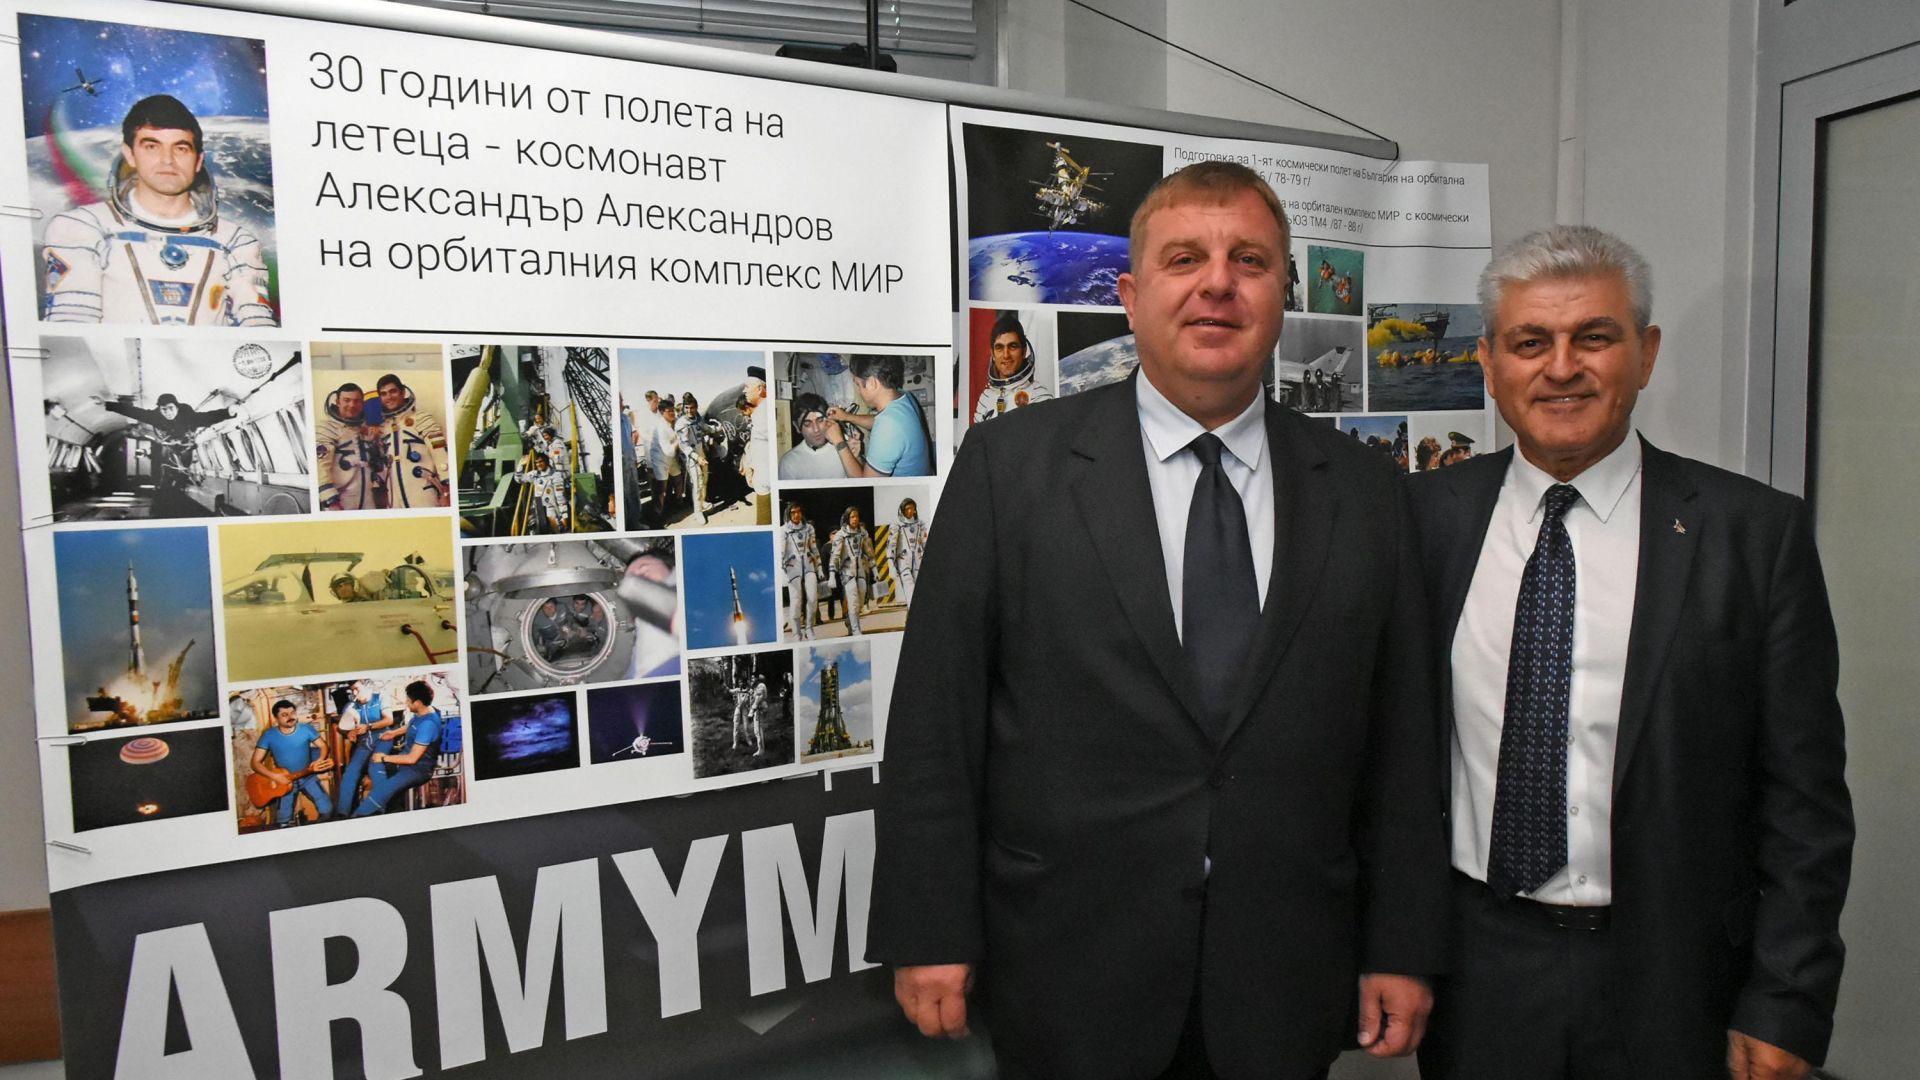 Красимир Каракачанов и Александър Александров